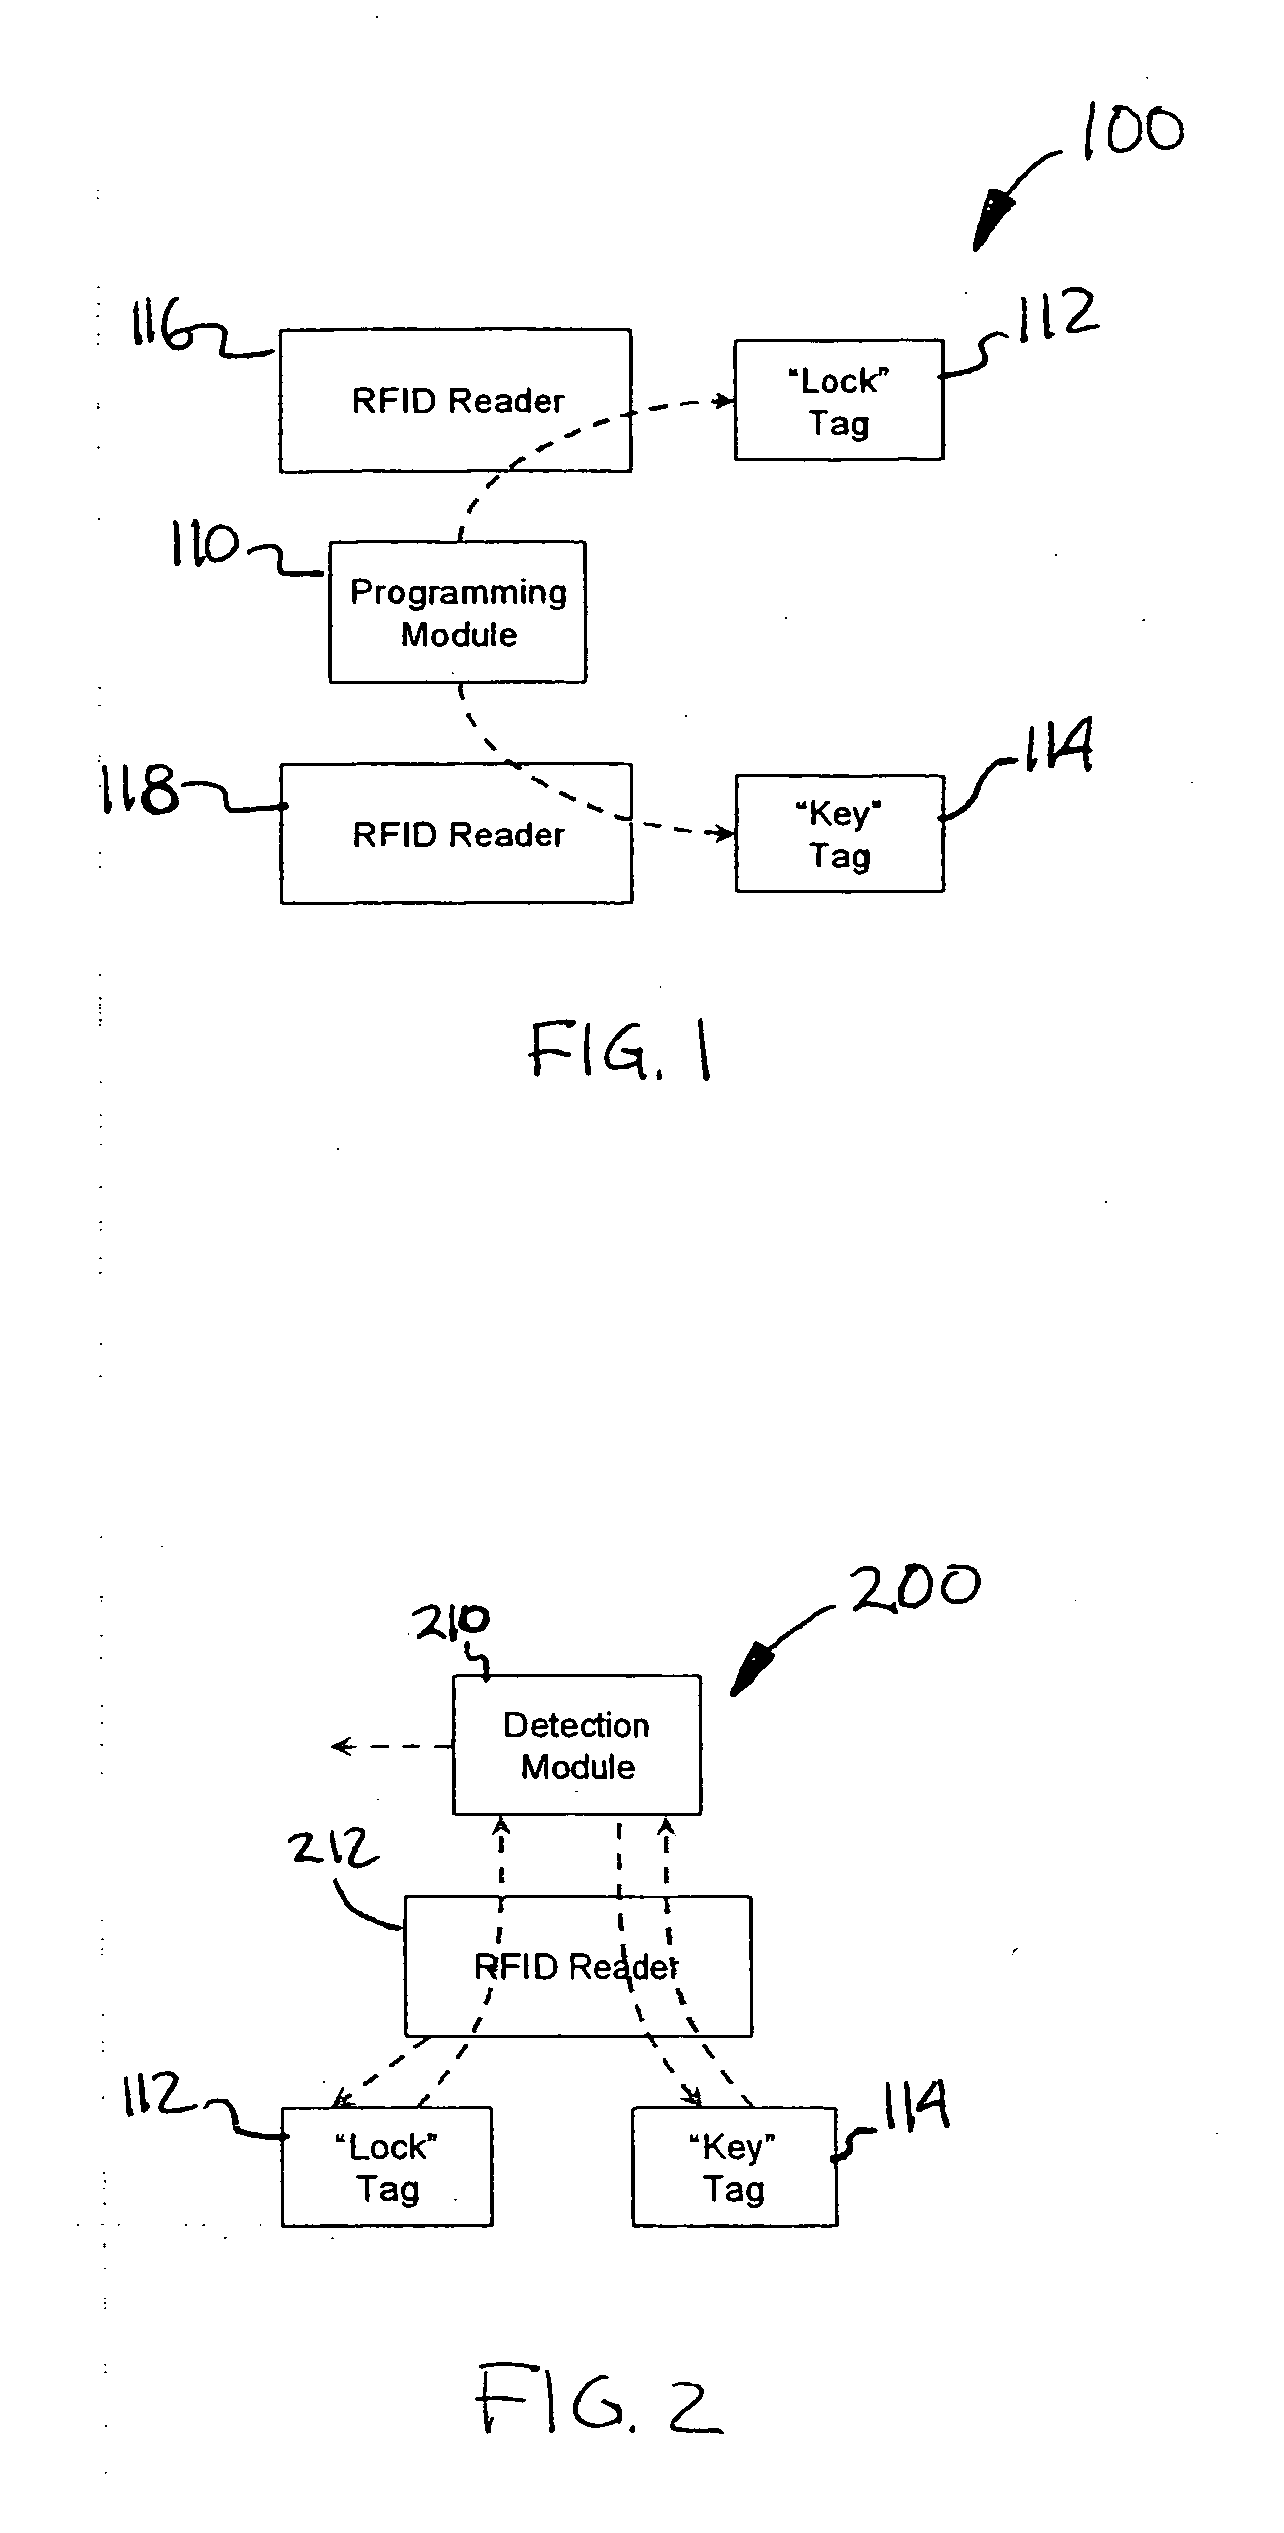 Radio-frequency identification